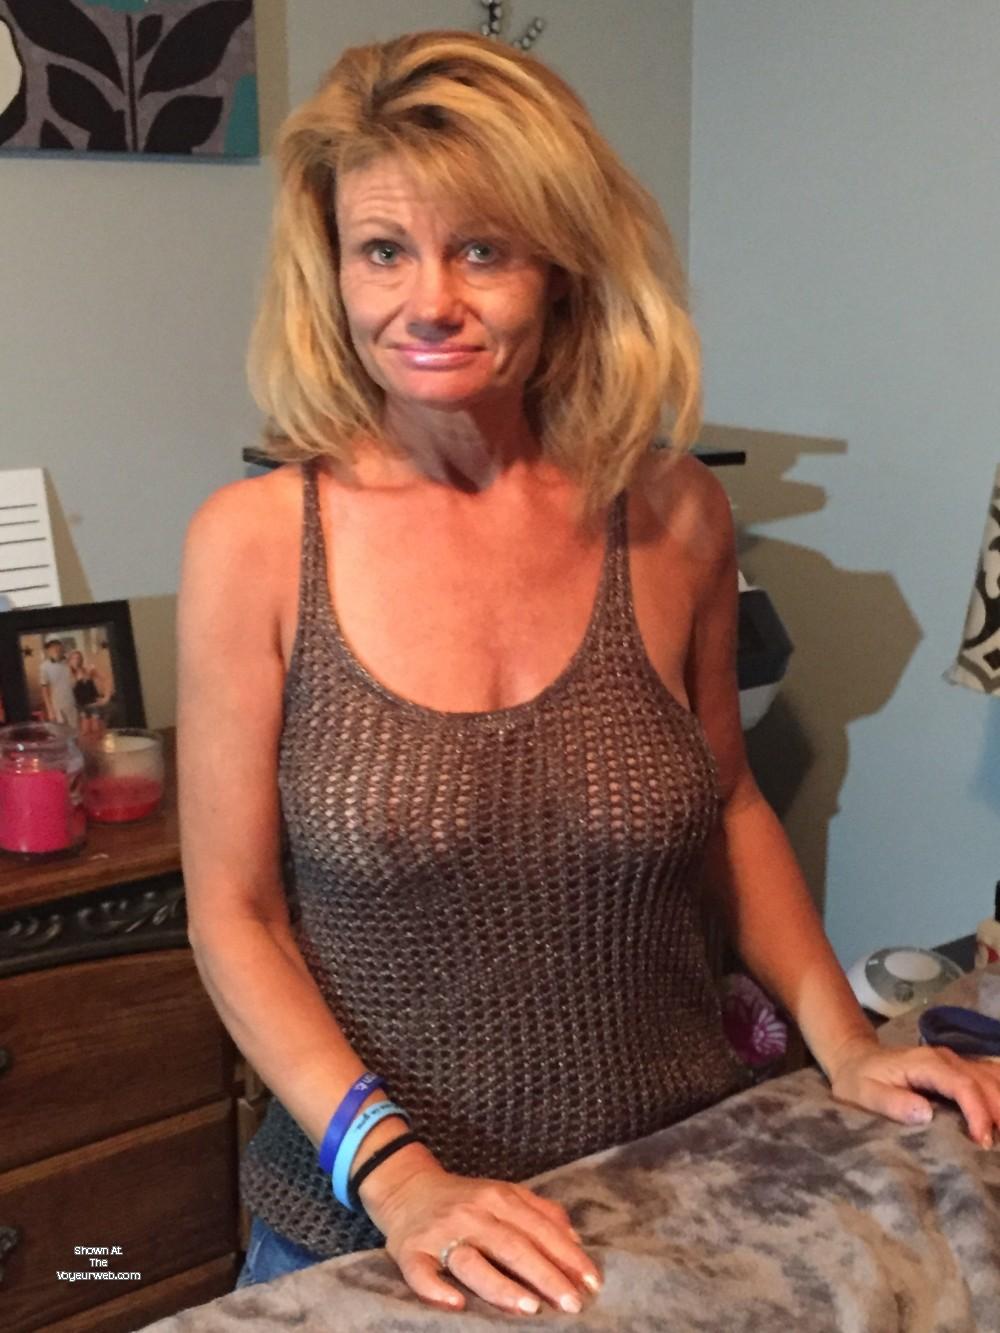 Ripon my wife tits pic